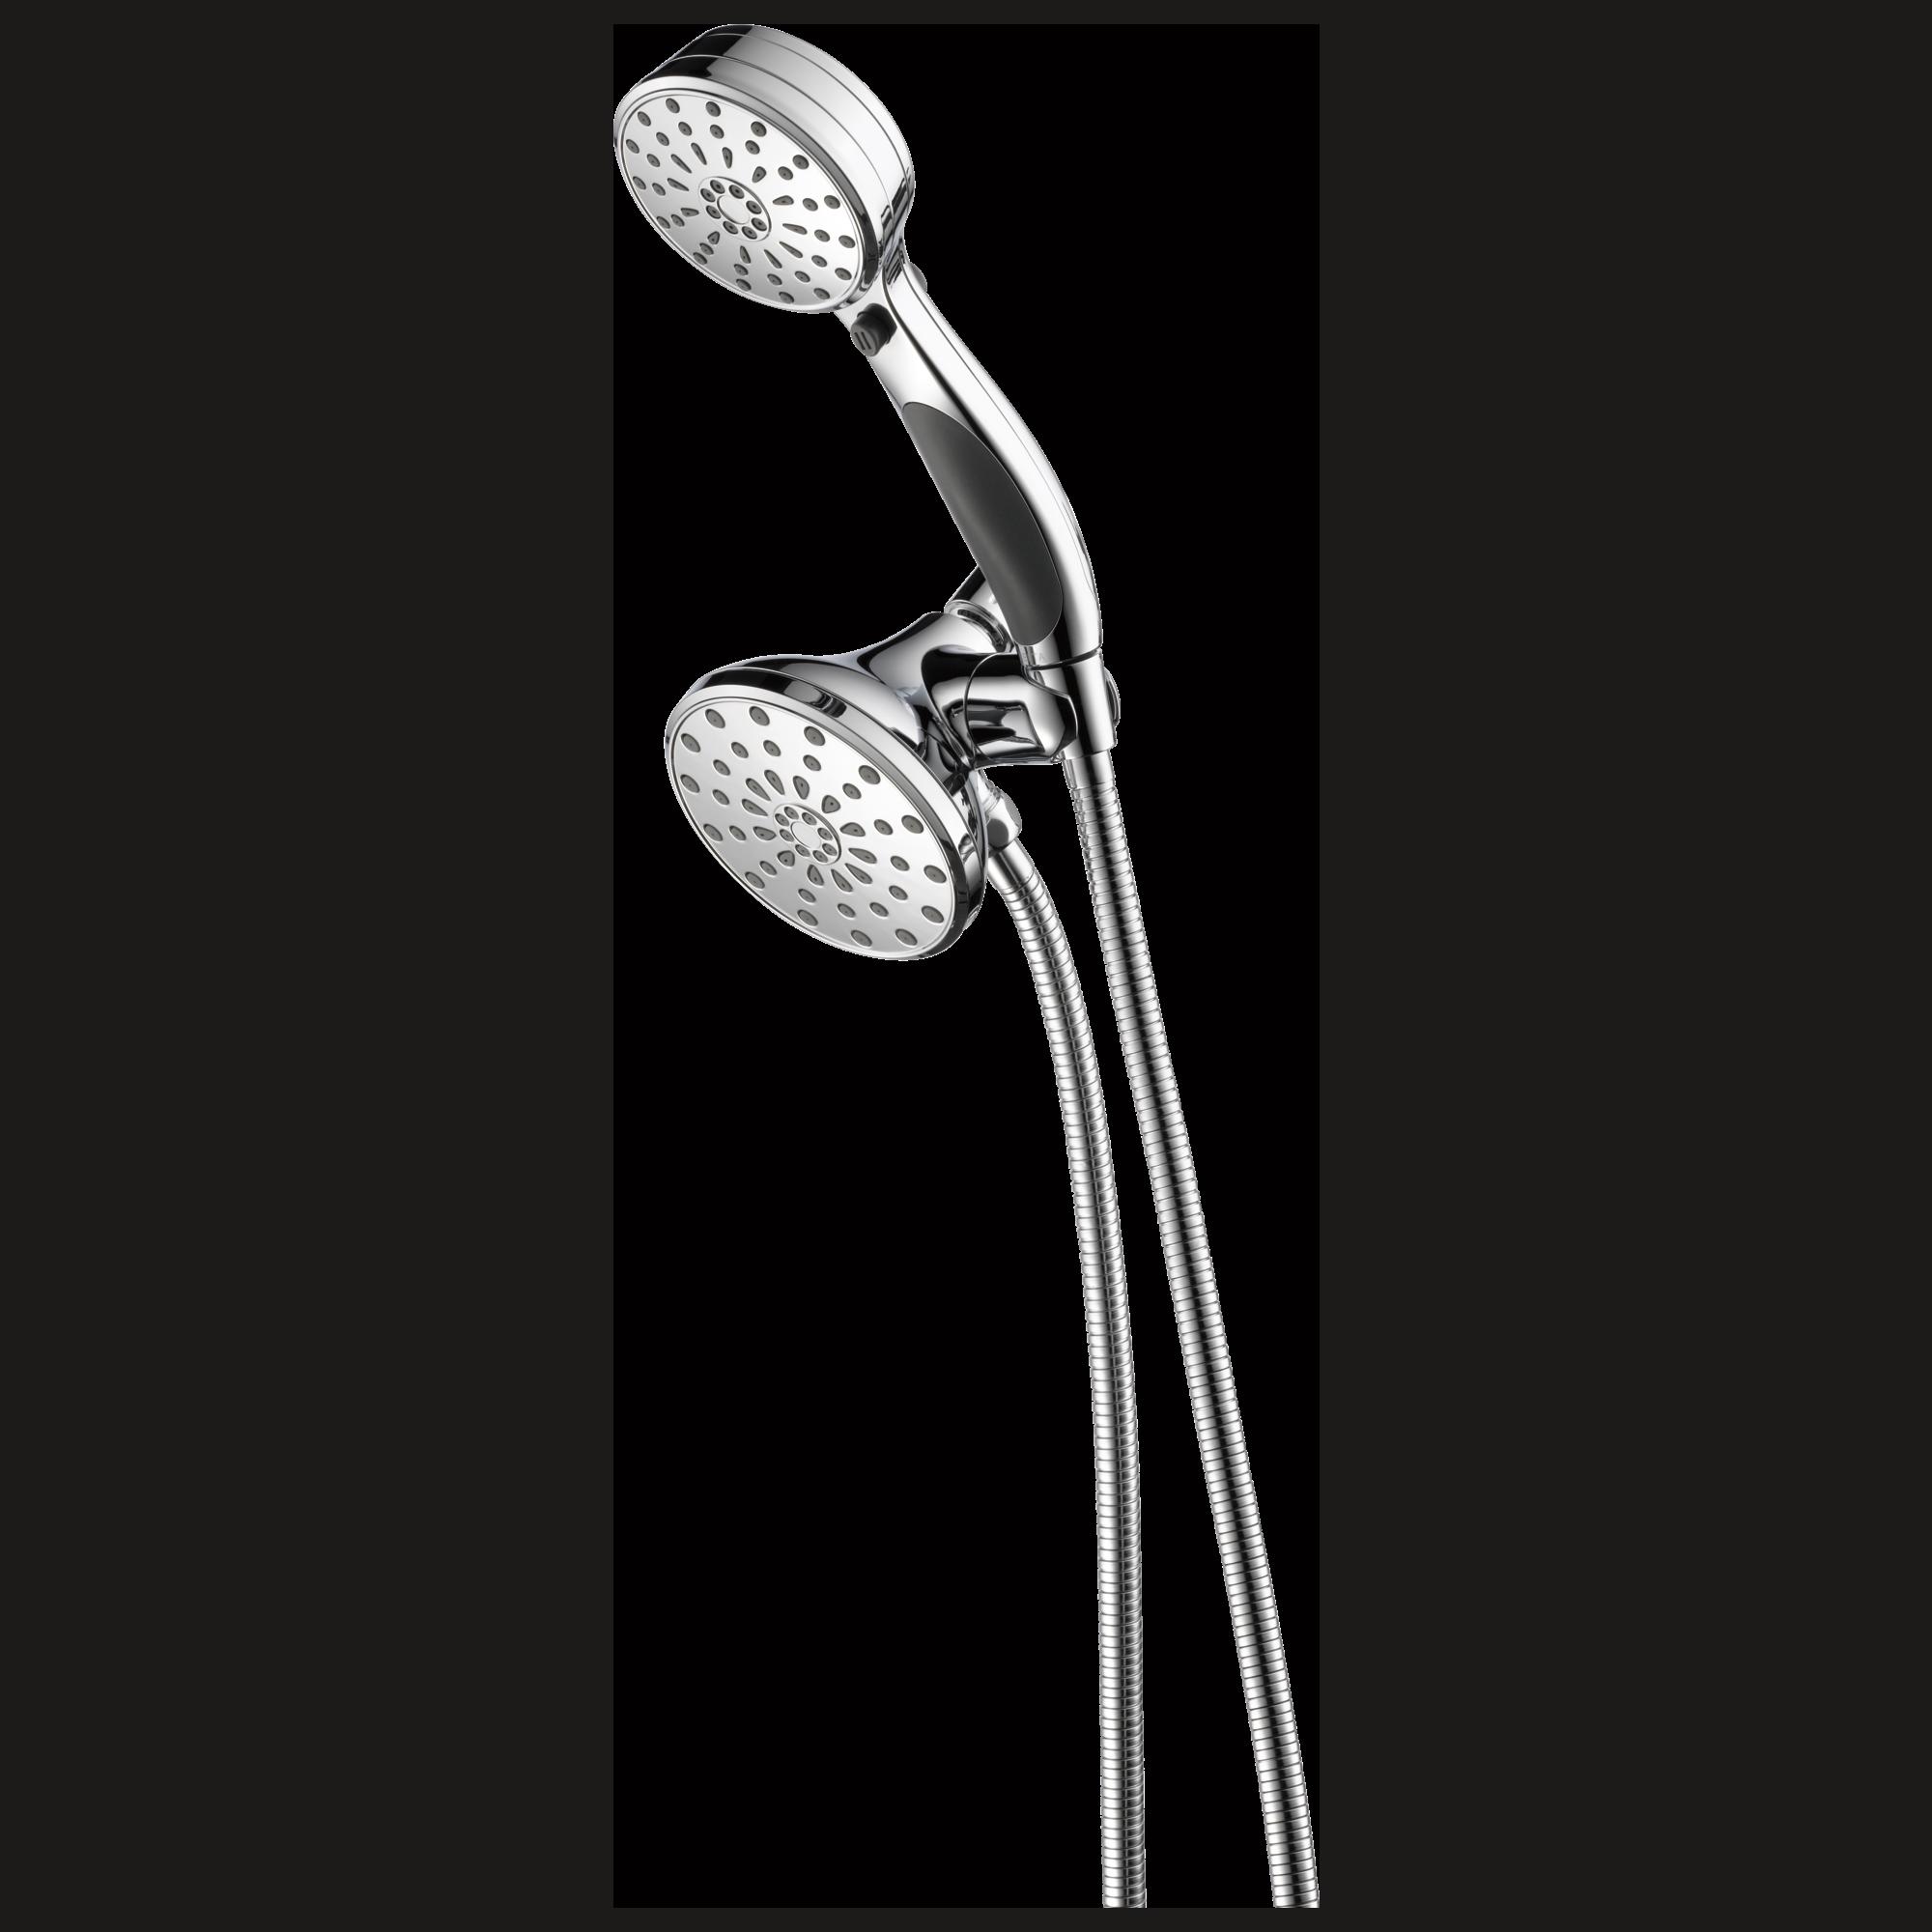 Delta Faucet 58968 Pk Activtouch Hand Shower Shower Head Combo